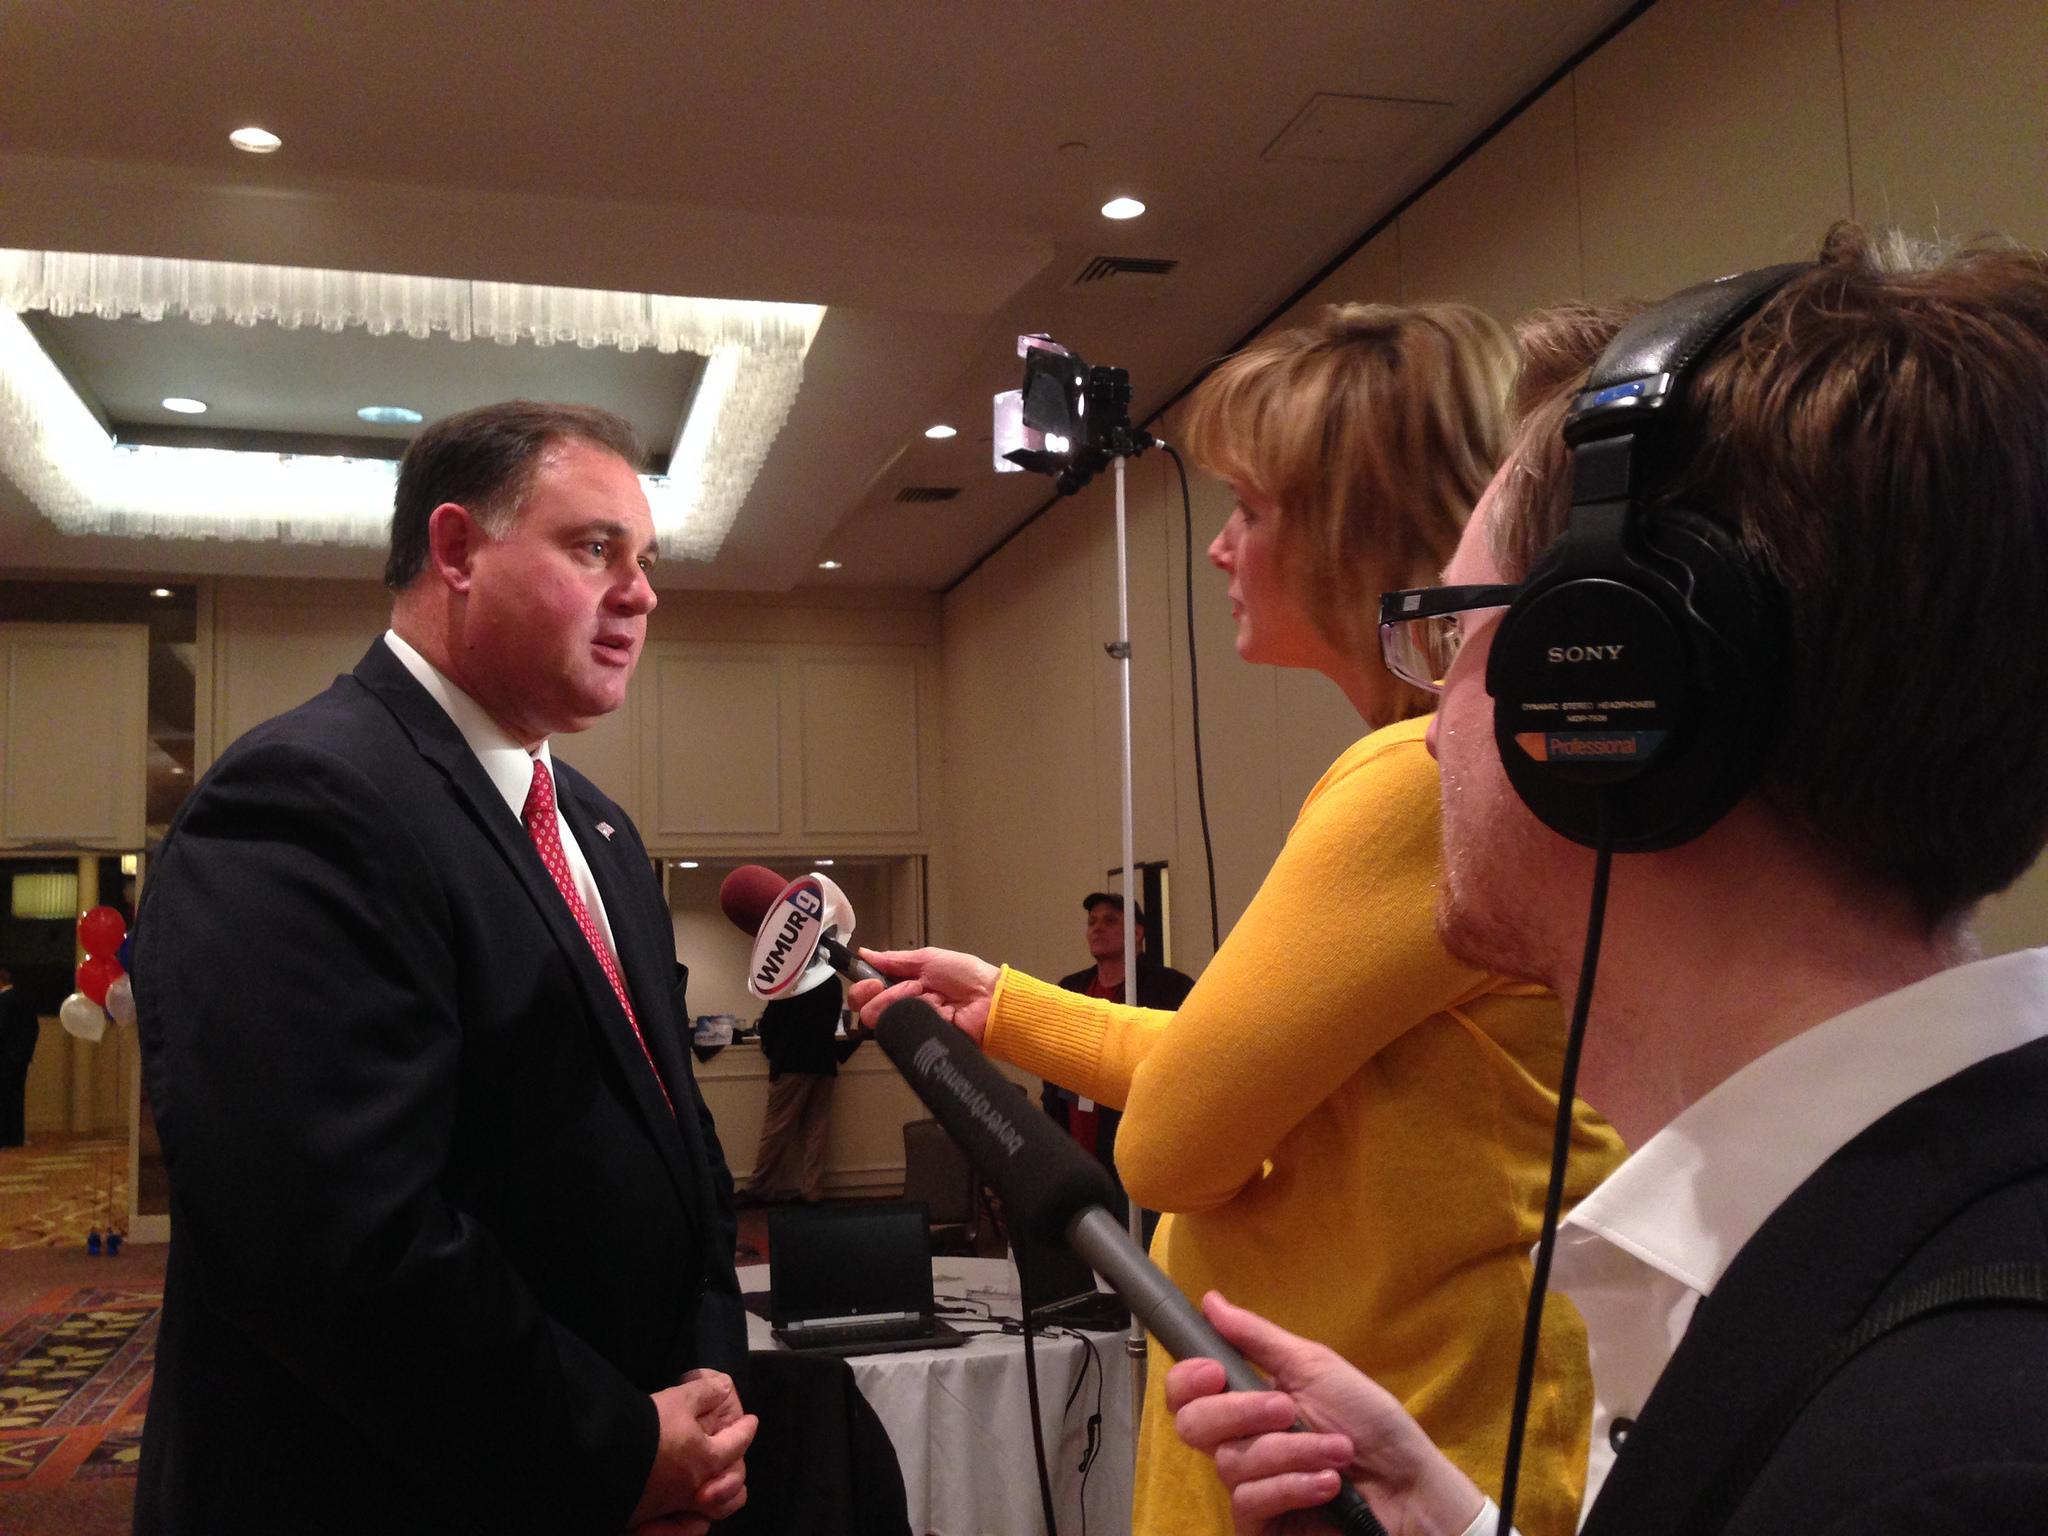 Ryan Lessard interviews Congressman Frank Guinta on election night, 2014